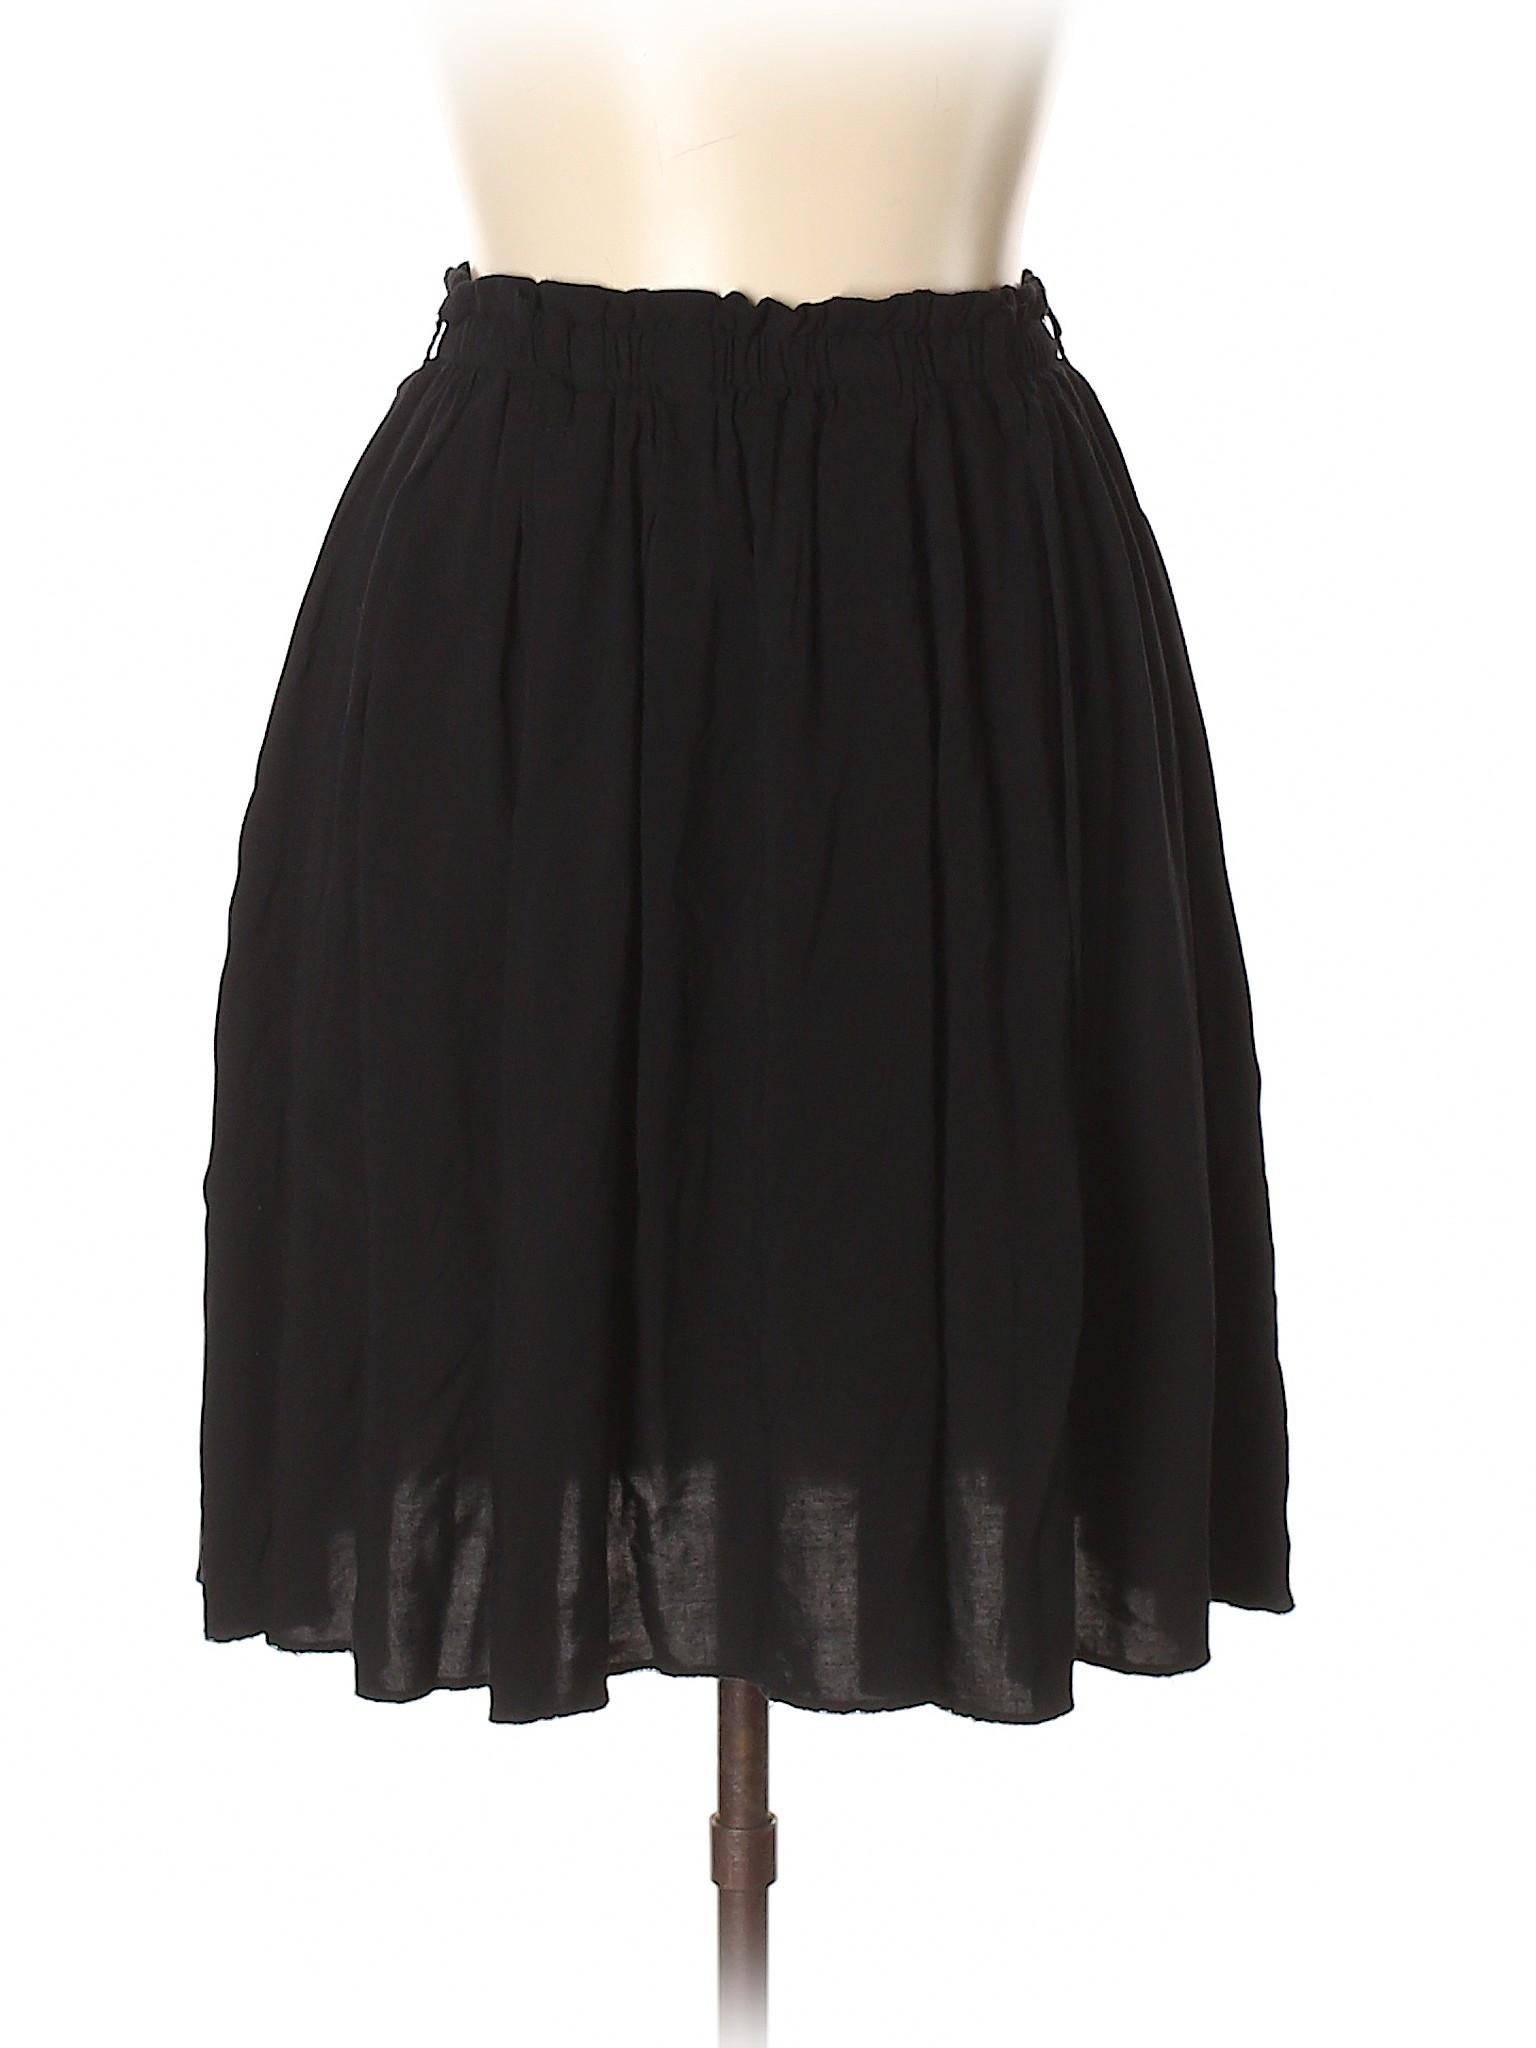 Xxi Casual Skirt Winter Skirt Xxi Winter Leisure Leisure Casual Leisure pSwAqpK0